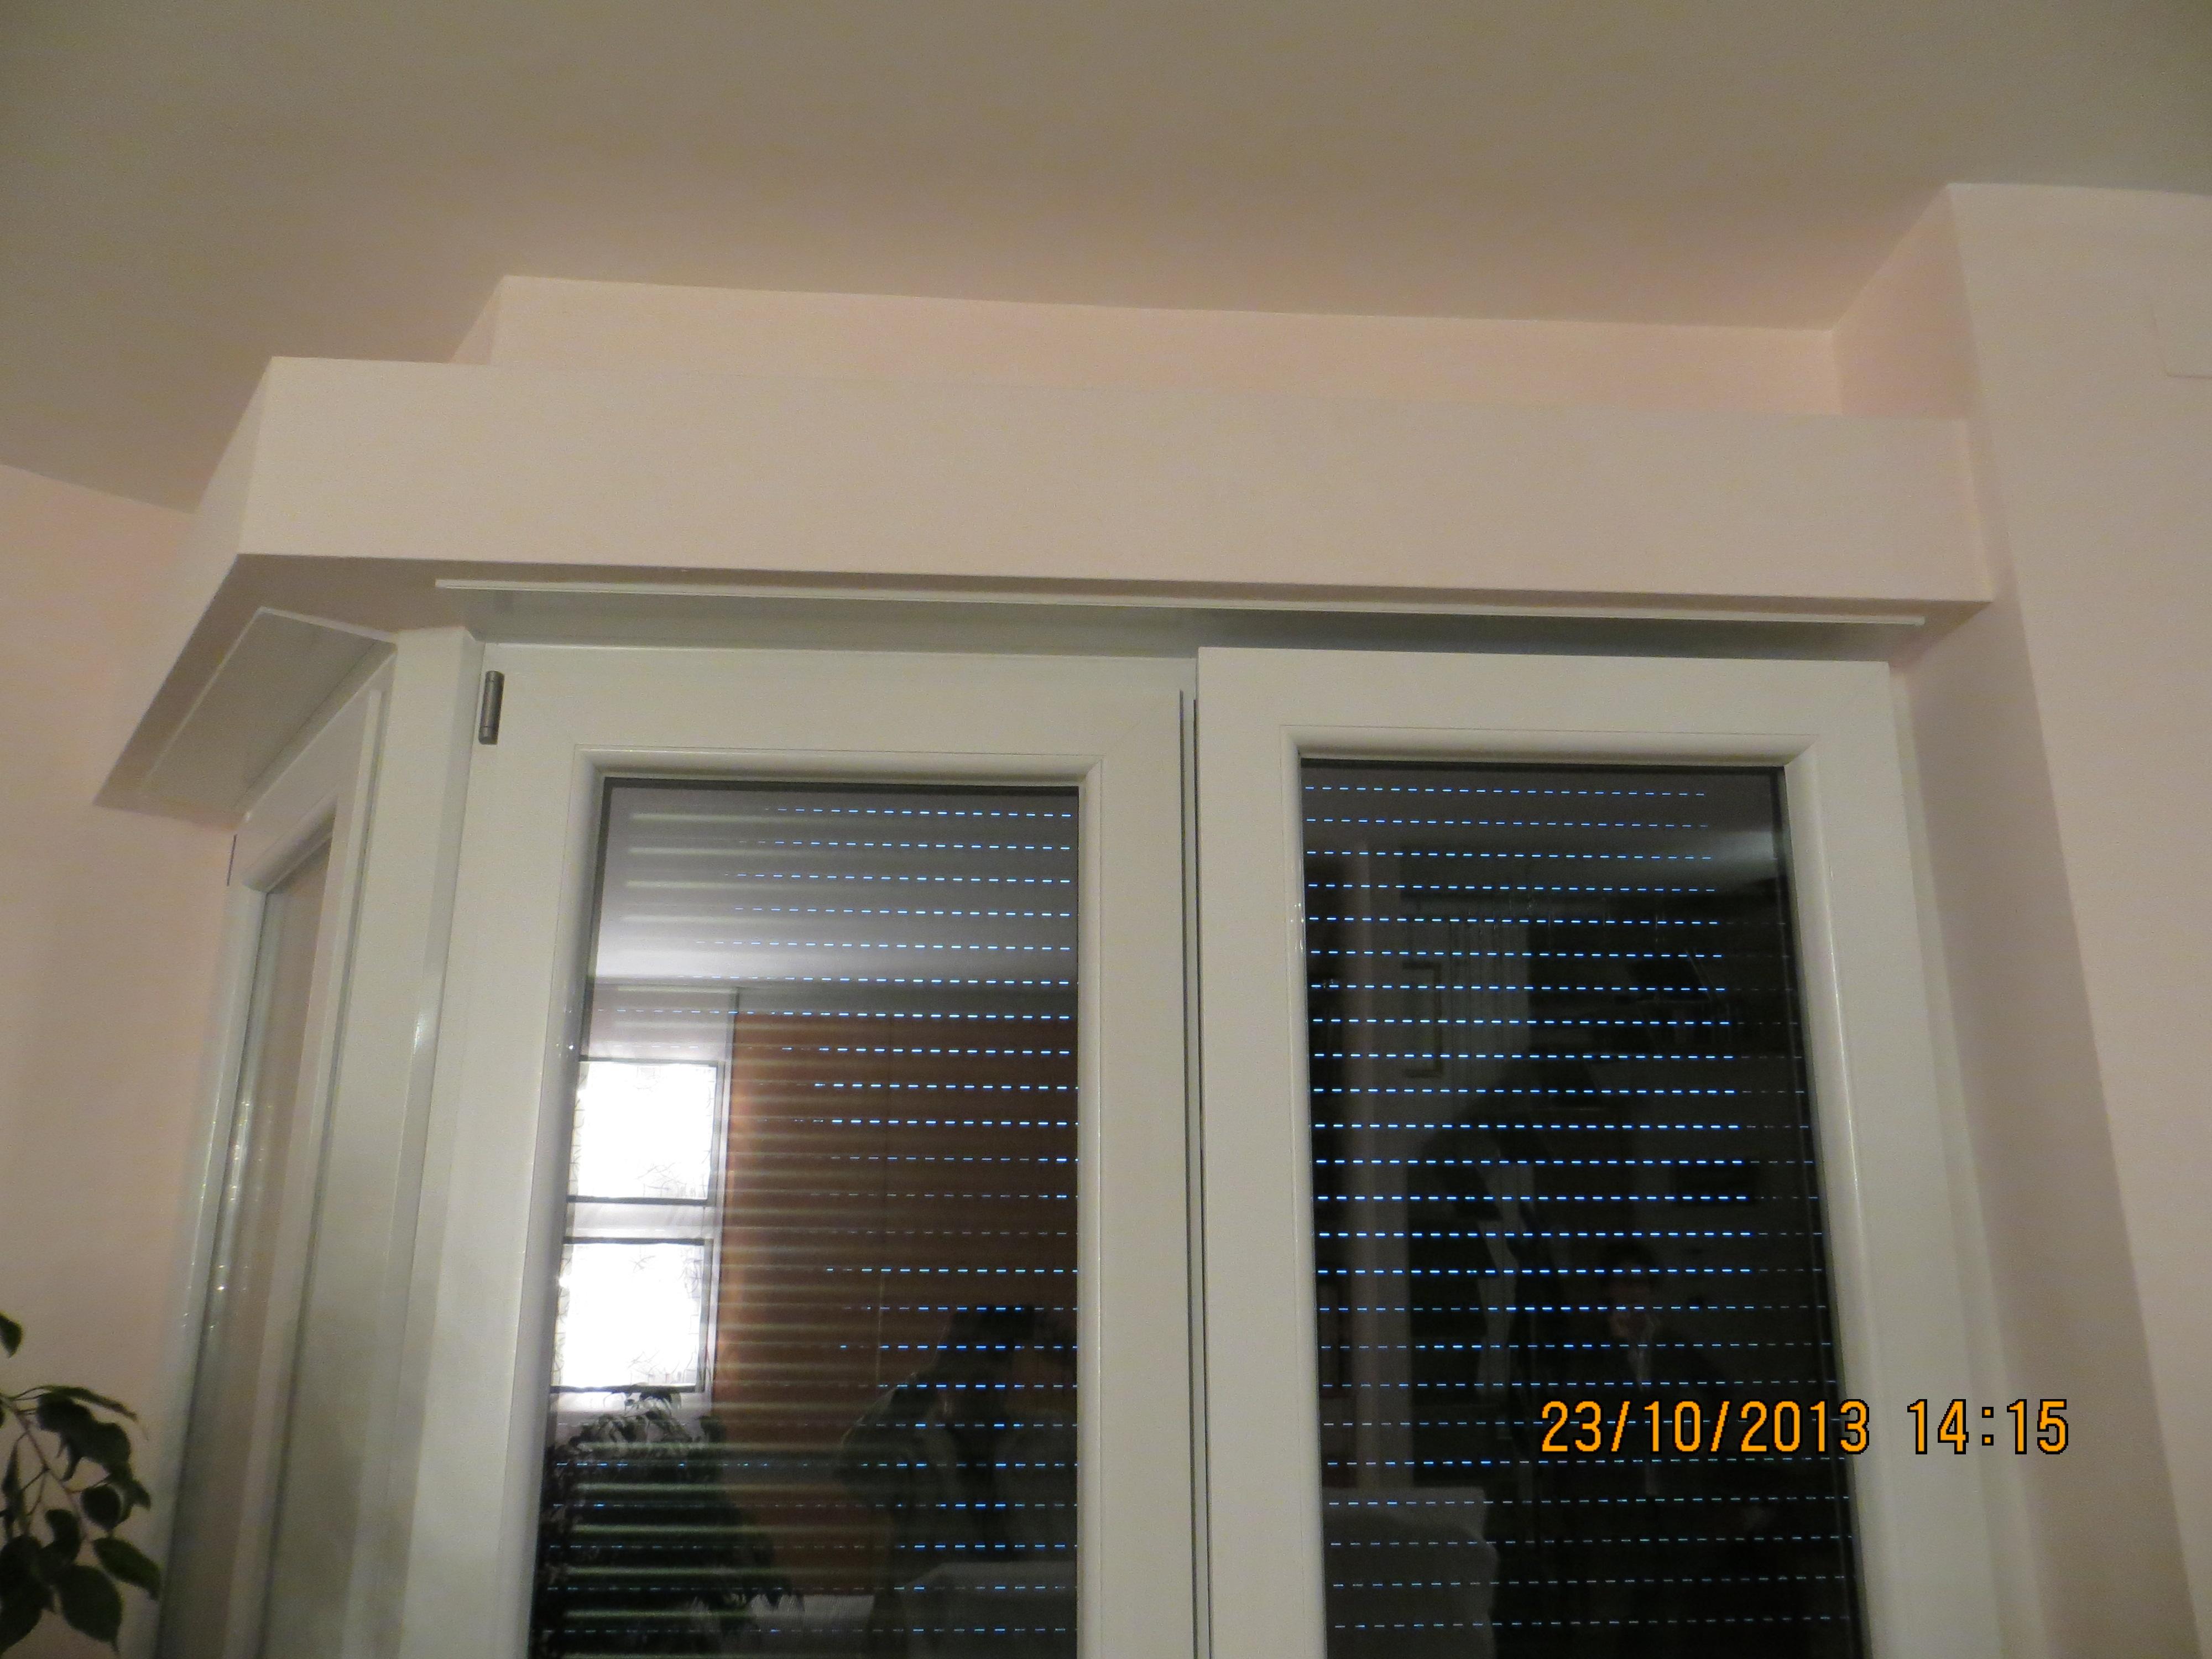 Porte finestre pvc monoblocco bianche energy3 energy3 - Finestre monoblocco in legno ...